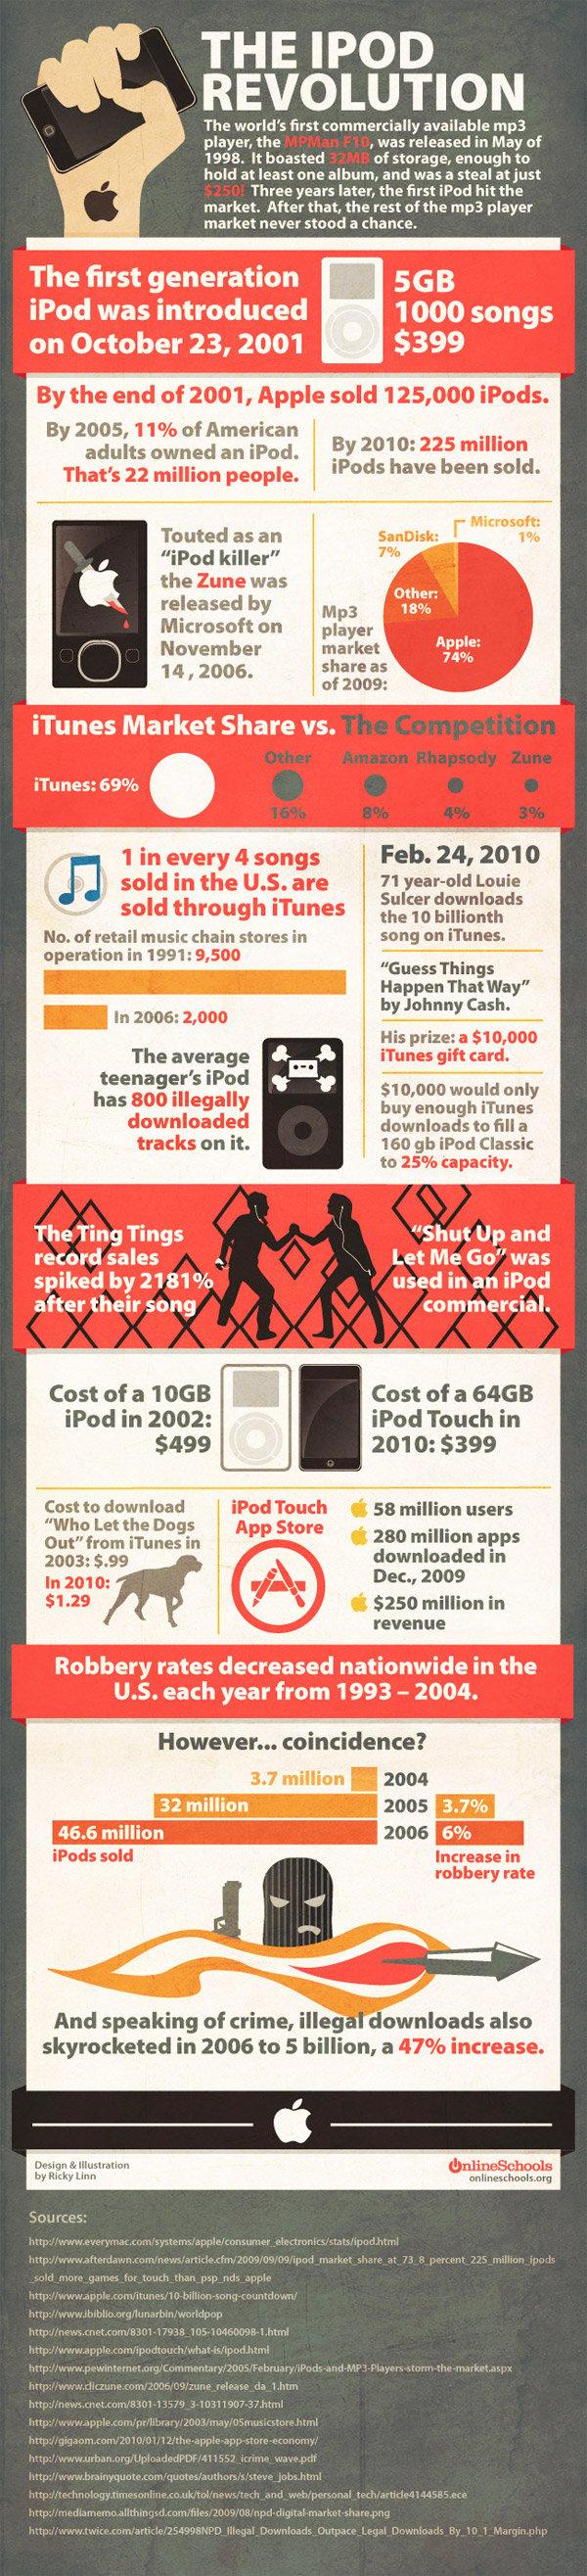 ipod_revolution_infographic